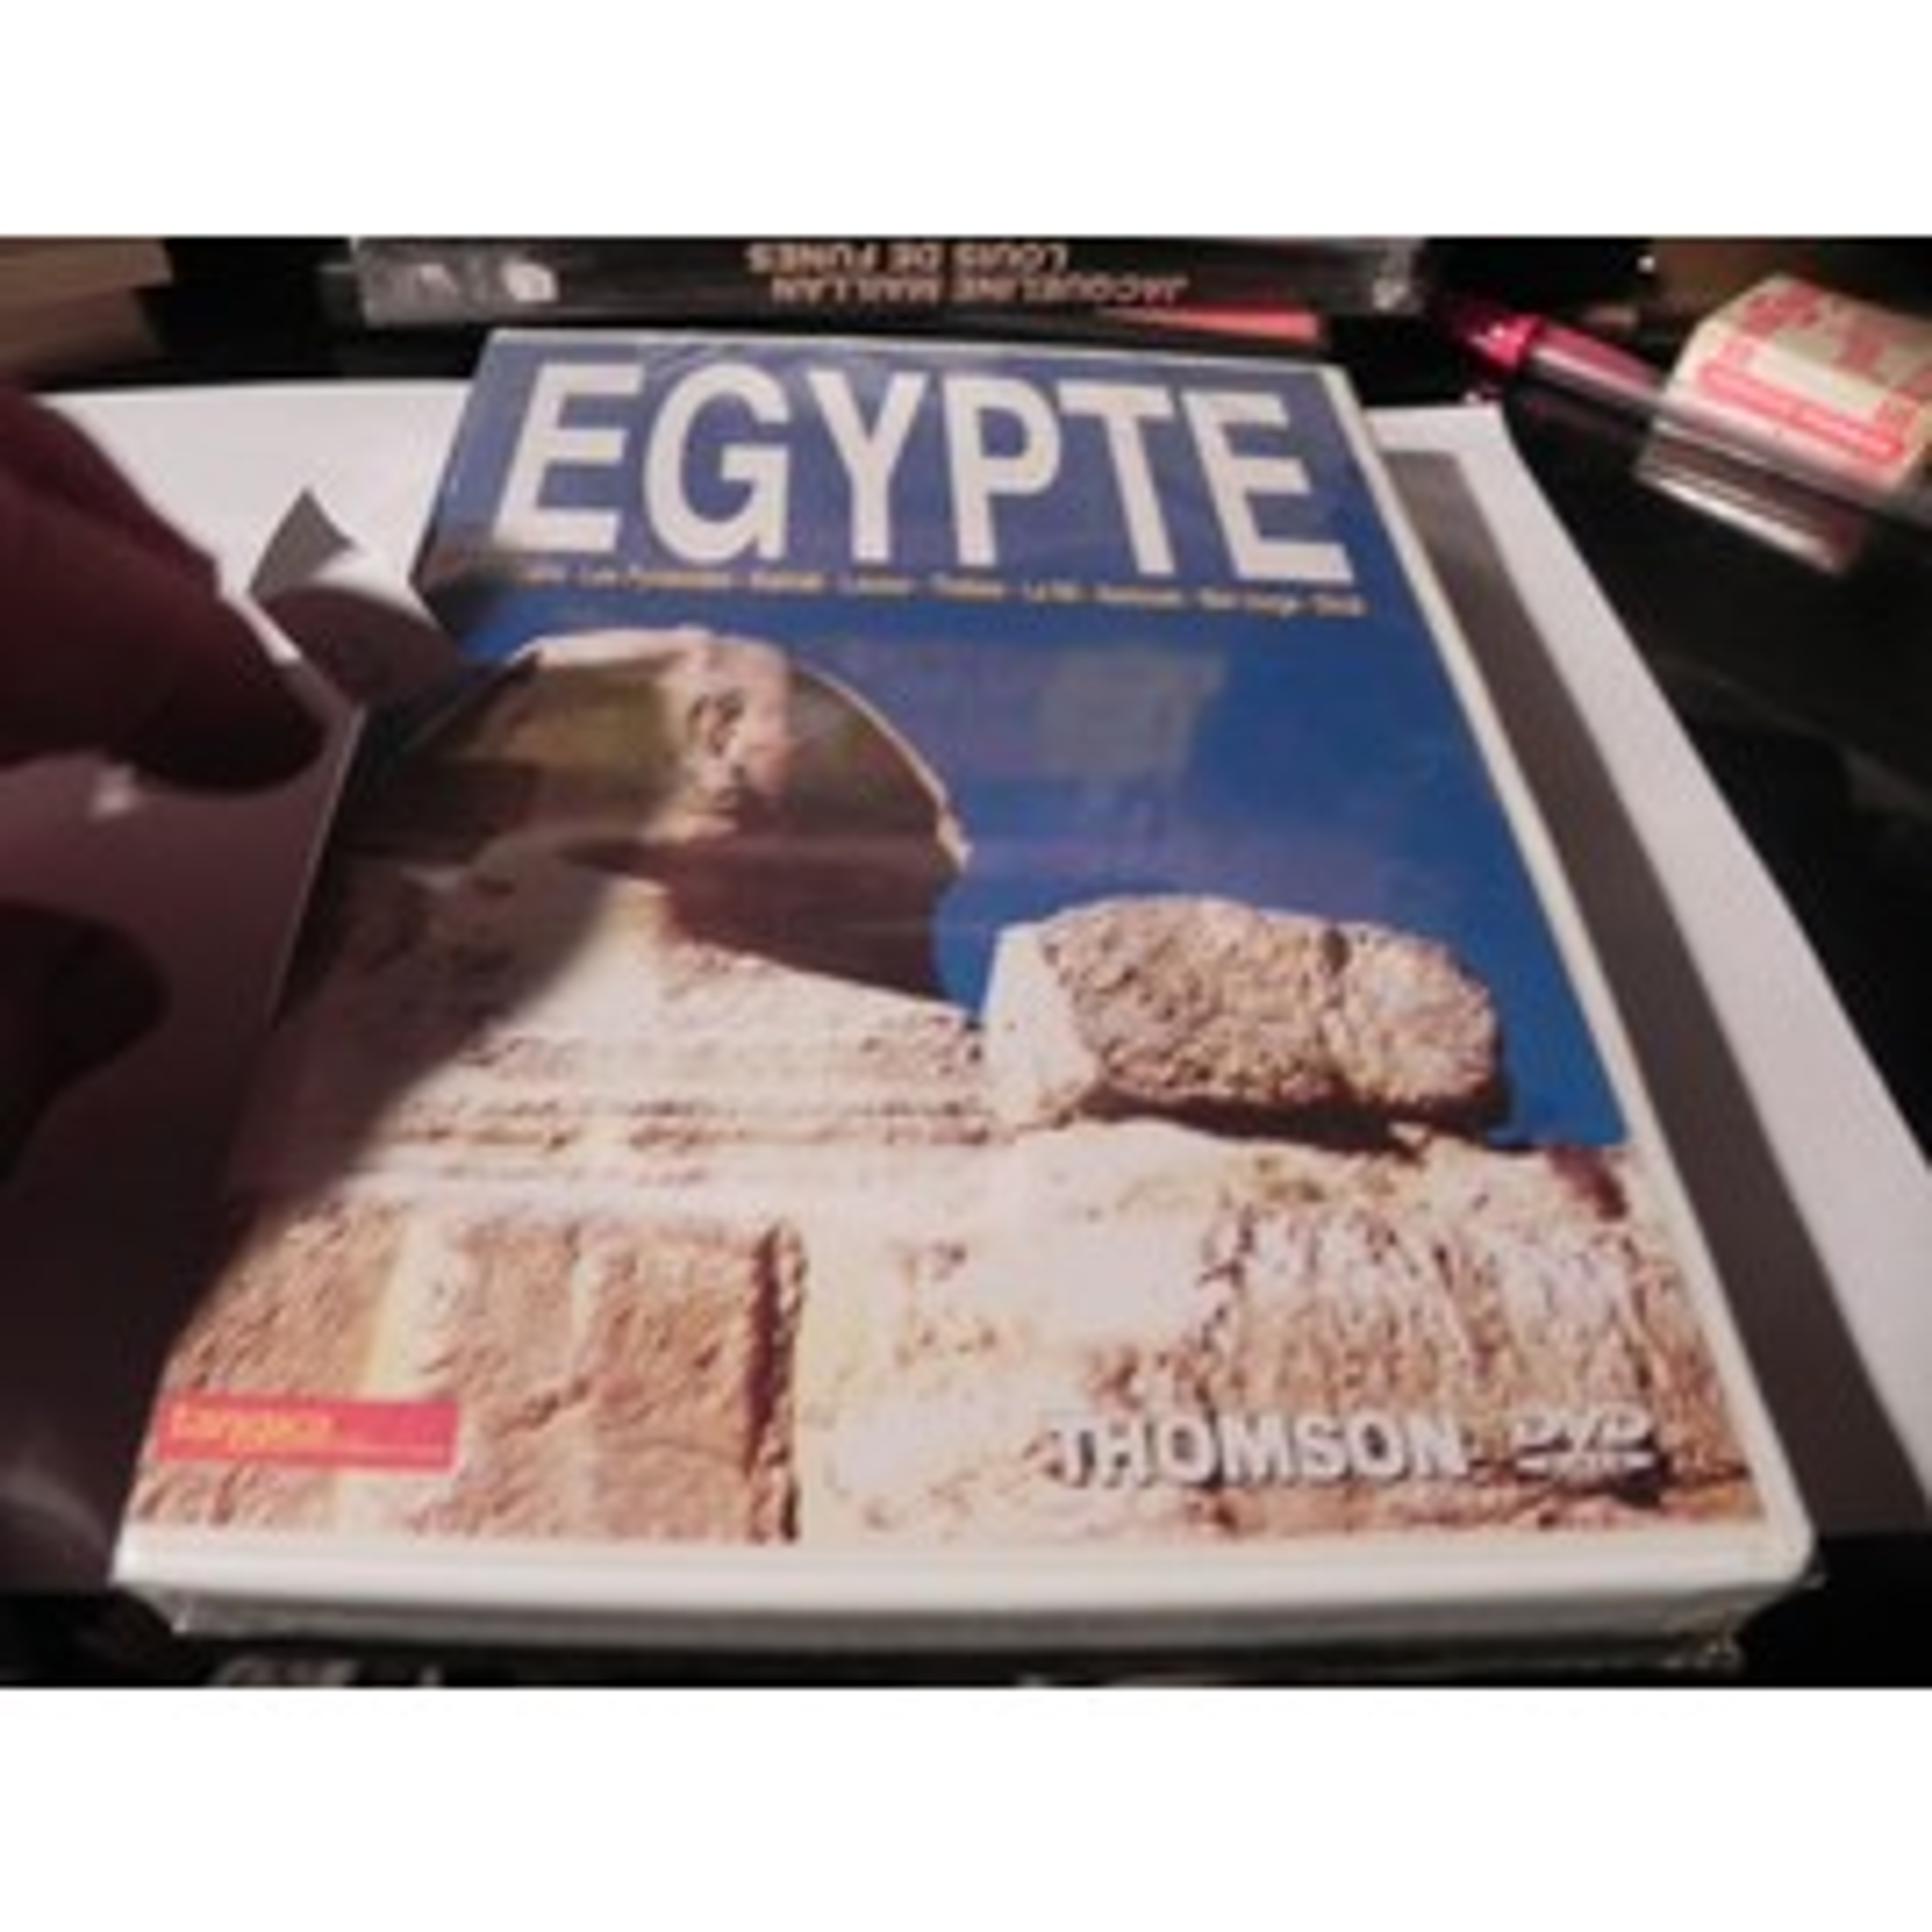 1 Dvd Neuf /Egypte/